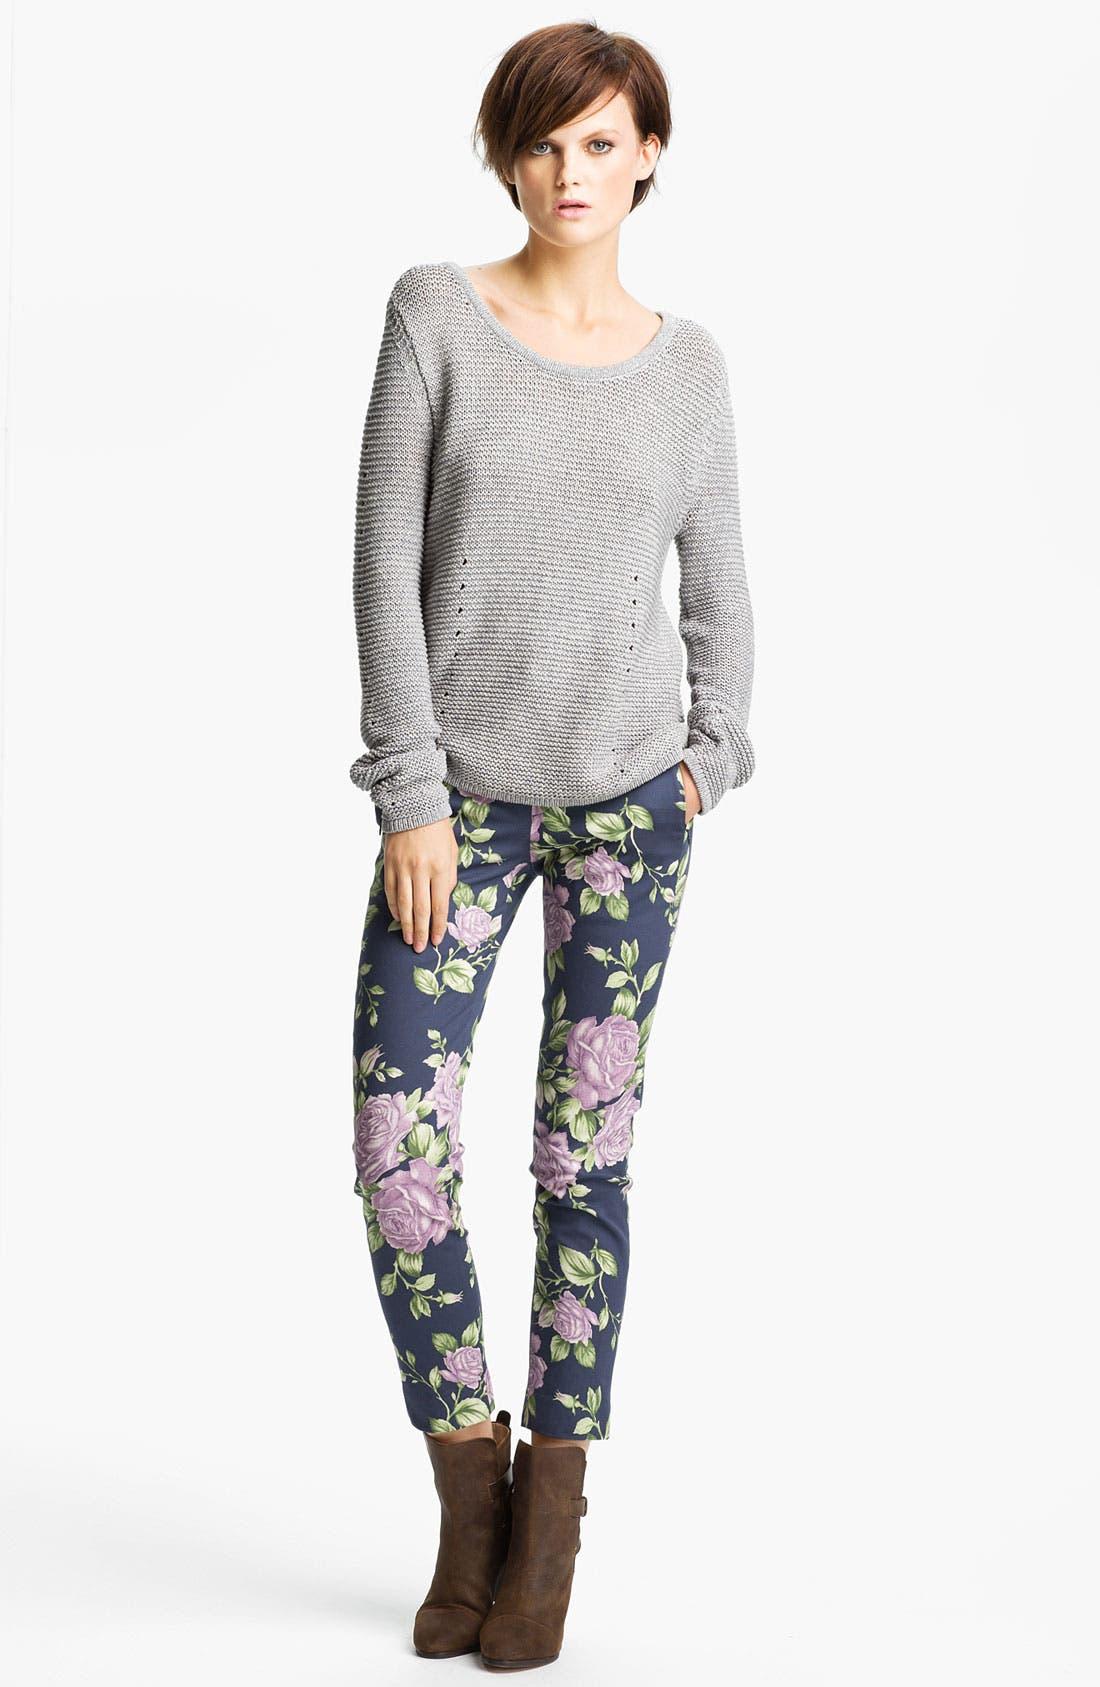 Alternate Image 1 Selected - rag & bone 'Laurel' Pullover